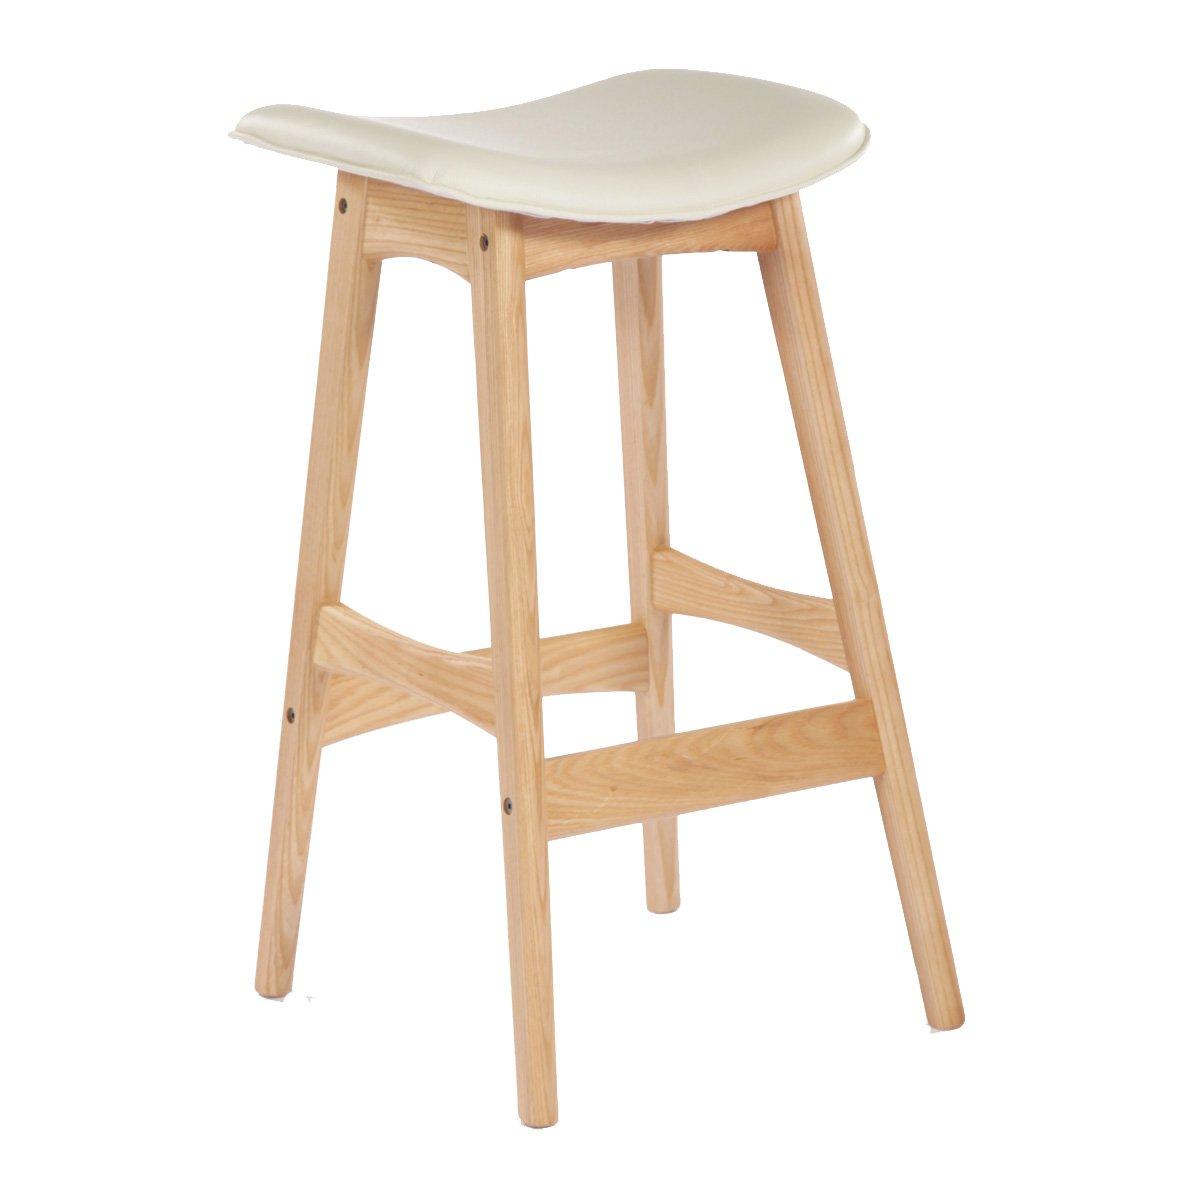 erik buch stool